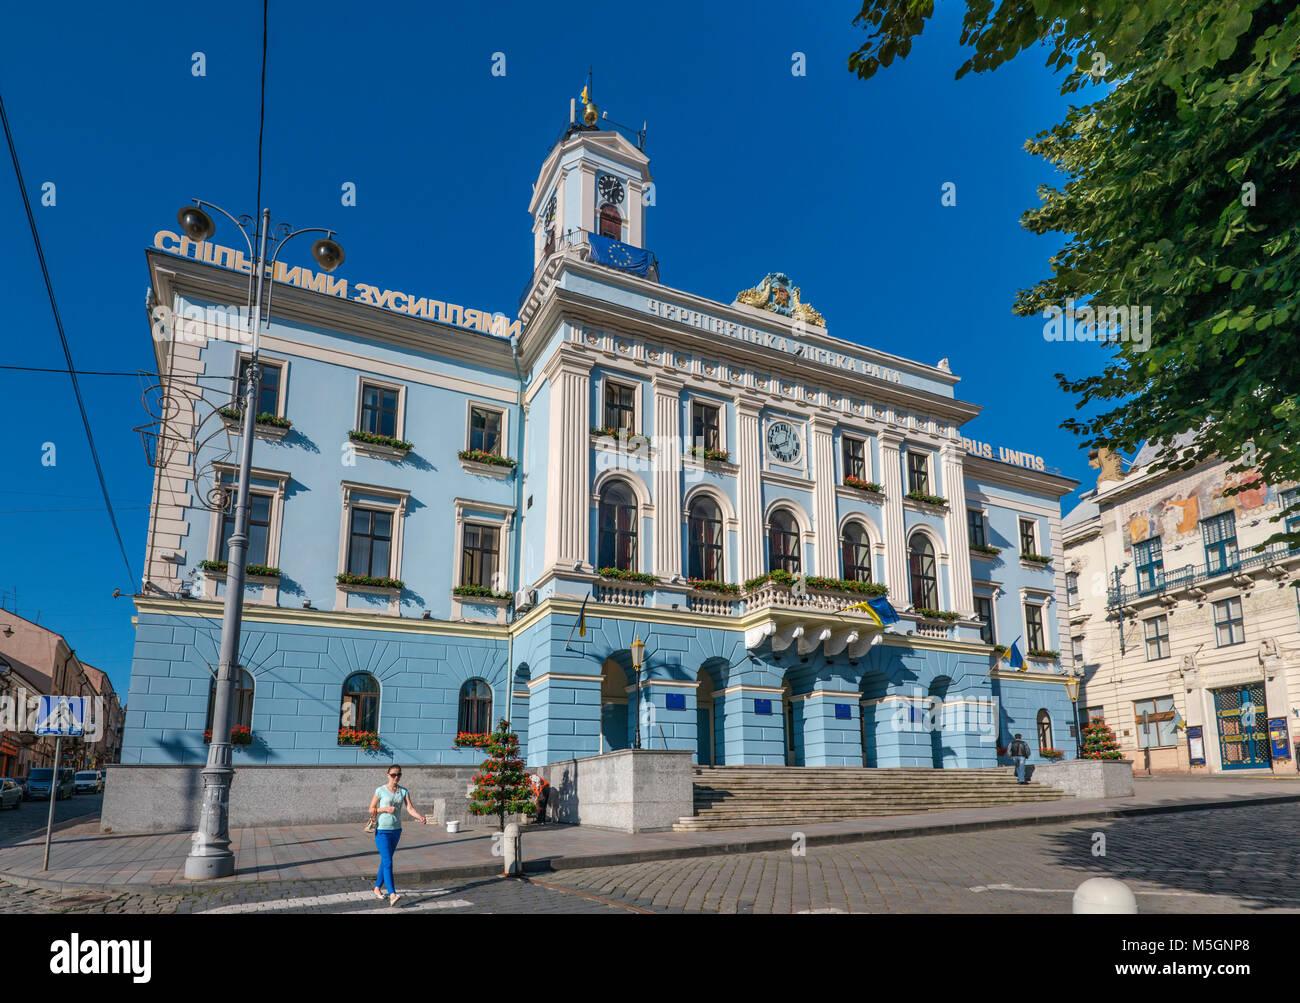 Ratusha (City Hall), 1847, at Central Square in Chernivtsi